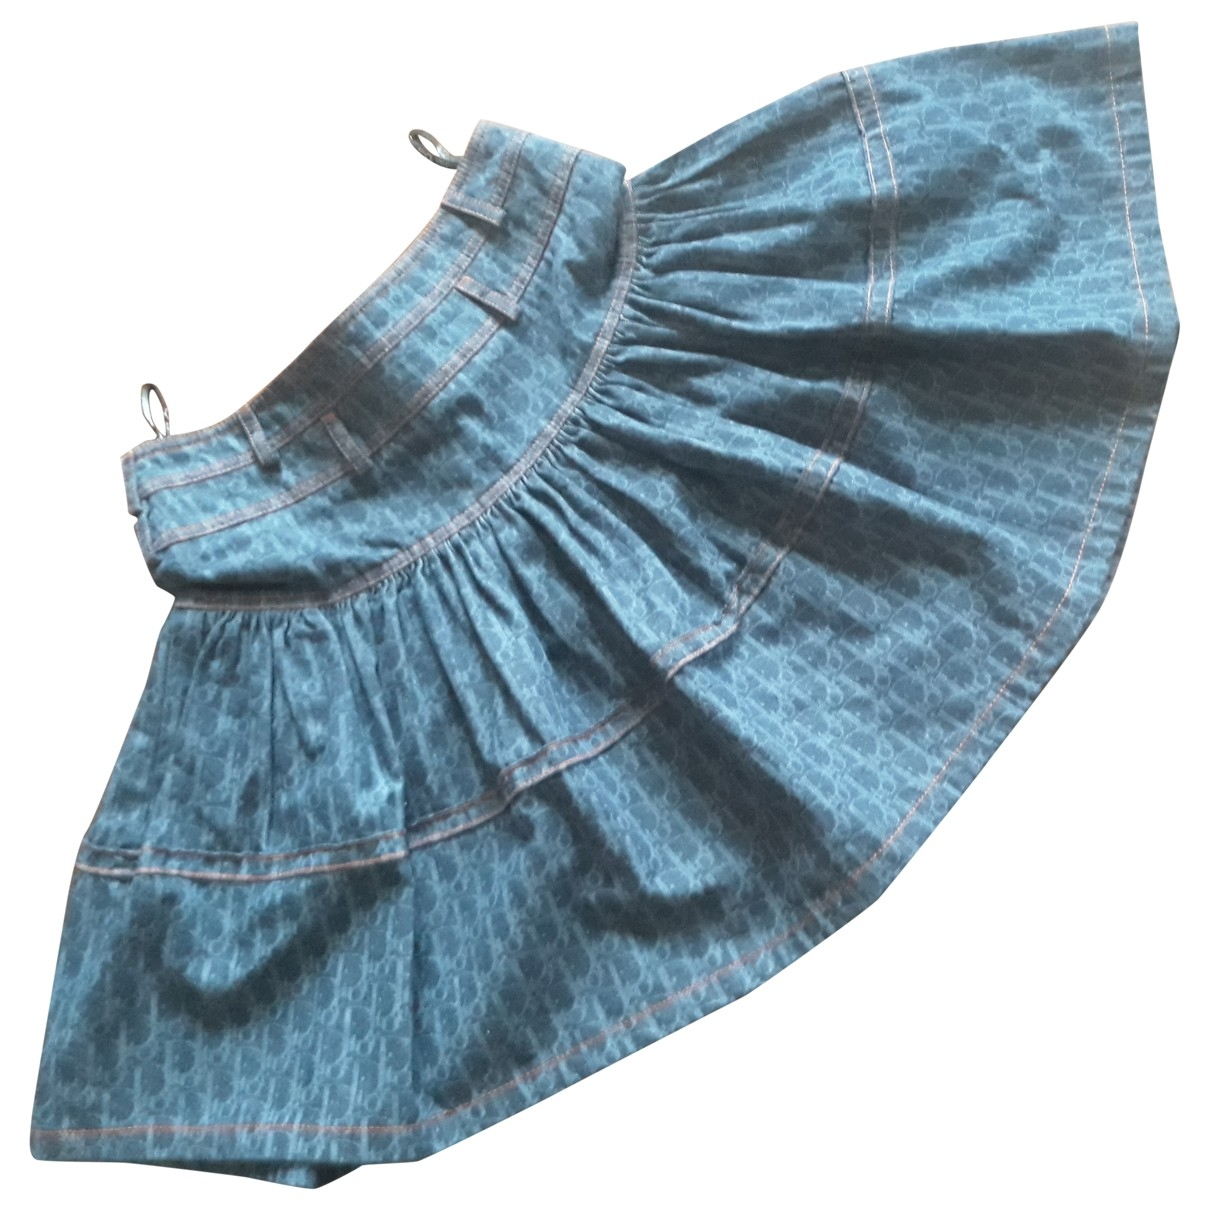 Dior - Jupe   pour femme en denim - bleu